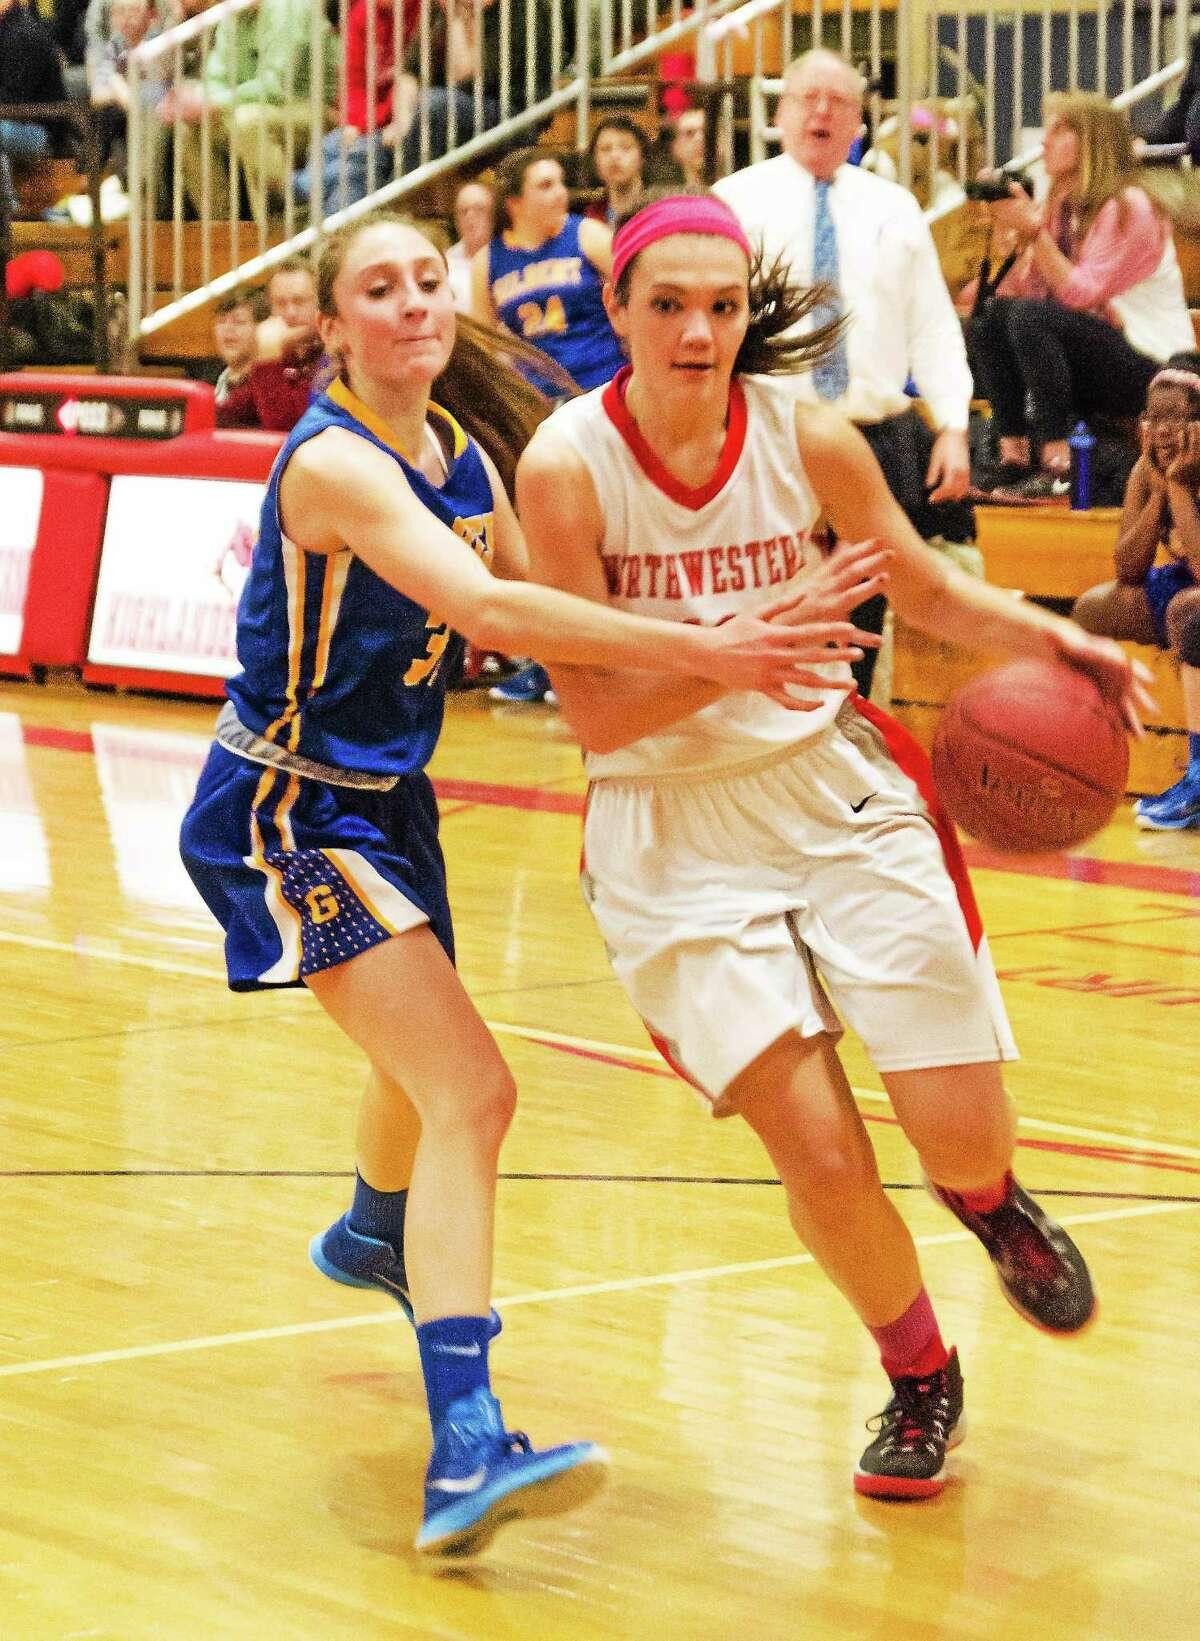 Northwestern's Emma Beltrandi drives to the basket against Gilbert's Ali Brochu Friday night.